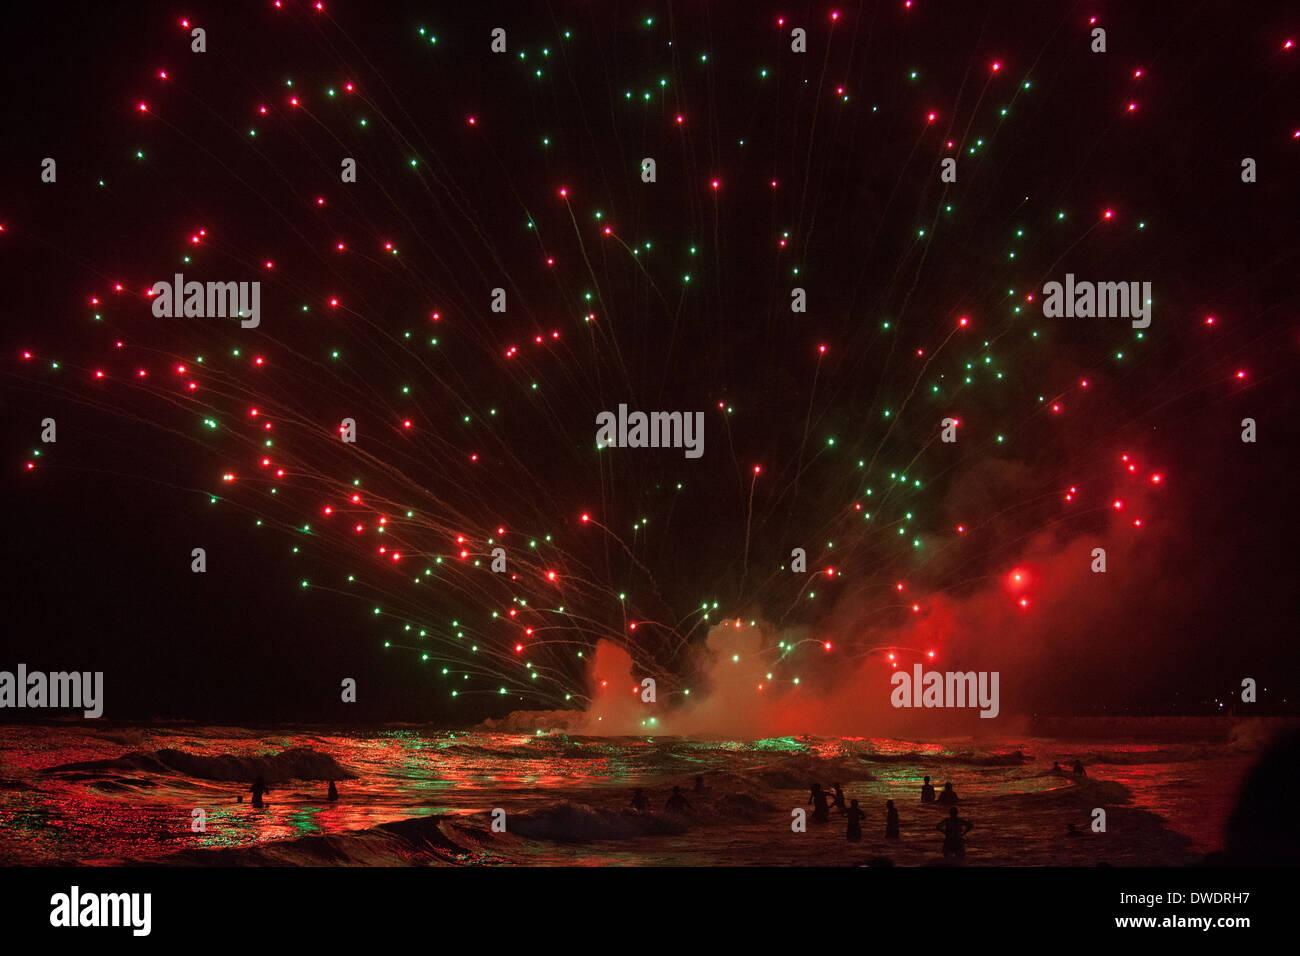 Fireworks in Fuengirola, Spain, at the celebration of Virgin Carmen in 2012. - Stock Image